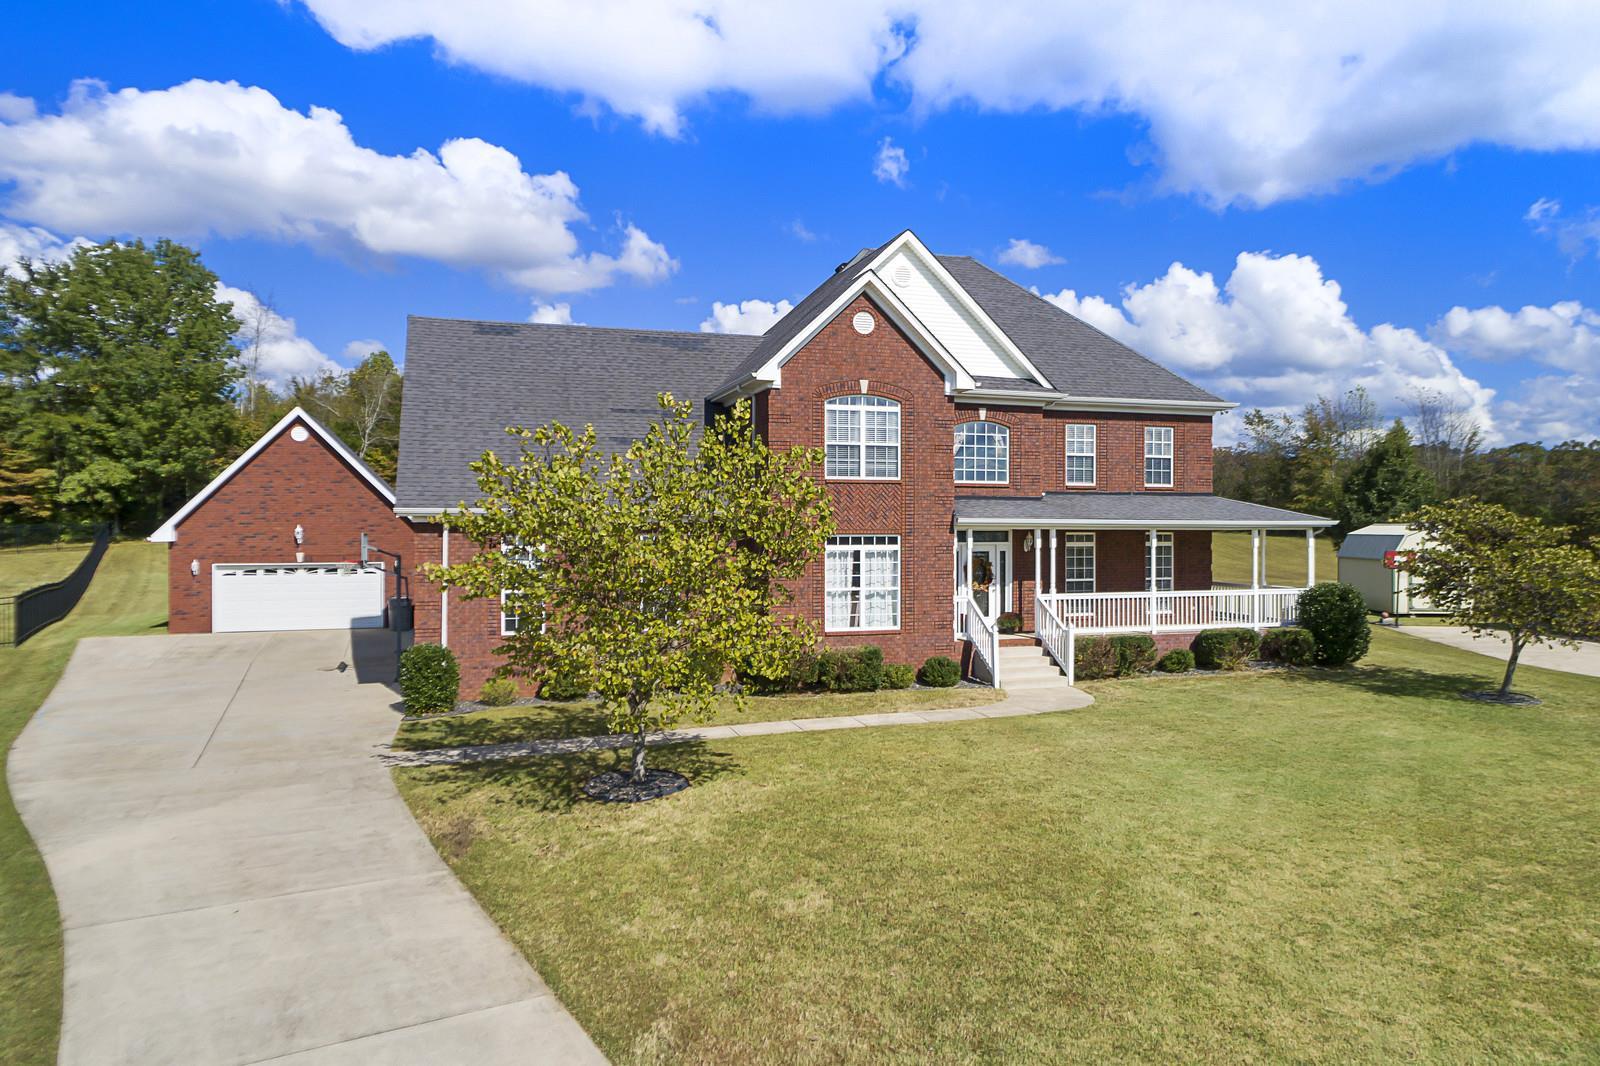 1083 Kacie Dr, Pleasant View, TN 37146 - Pleasant View, TN real estate listing